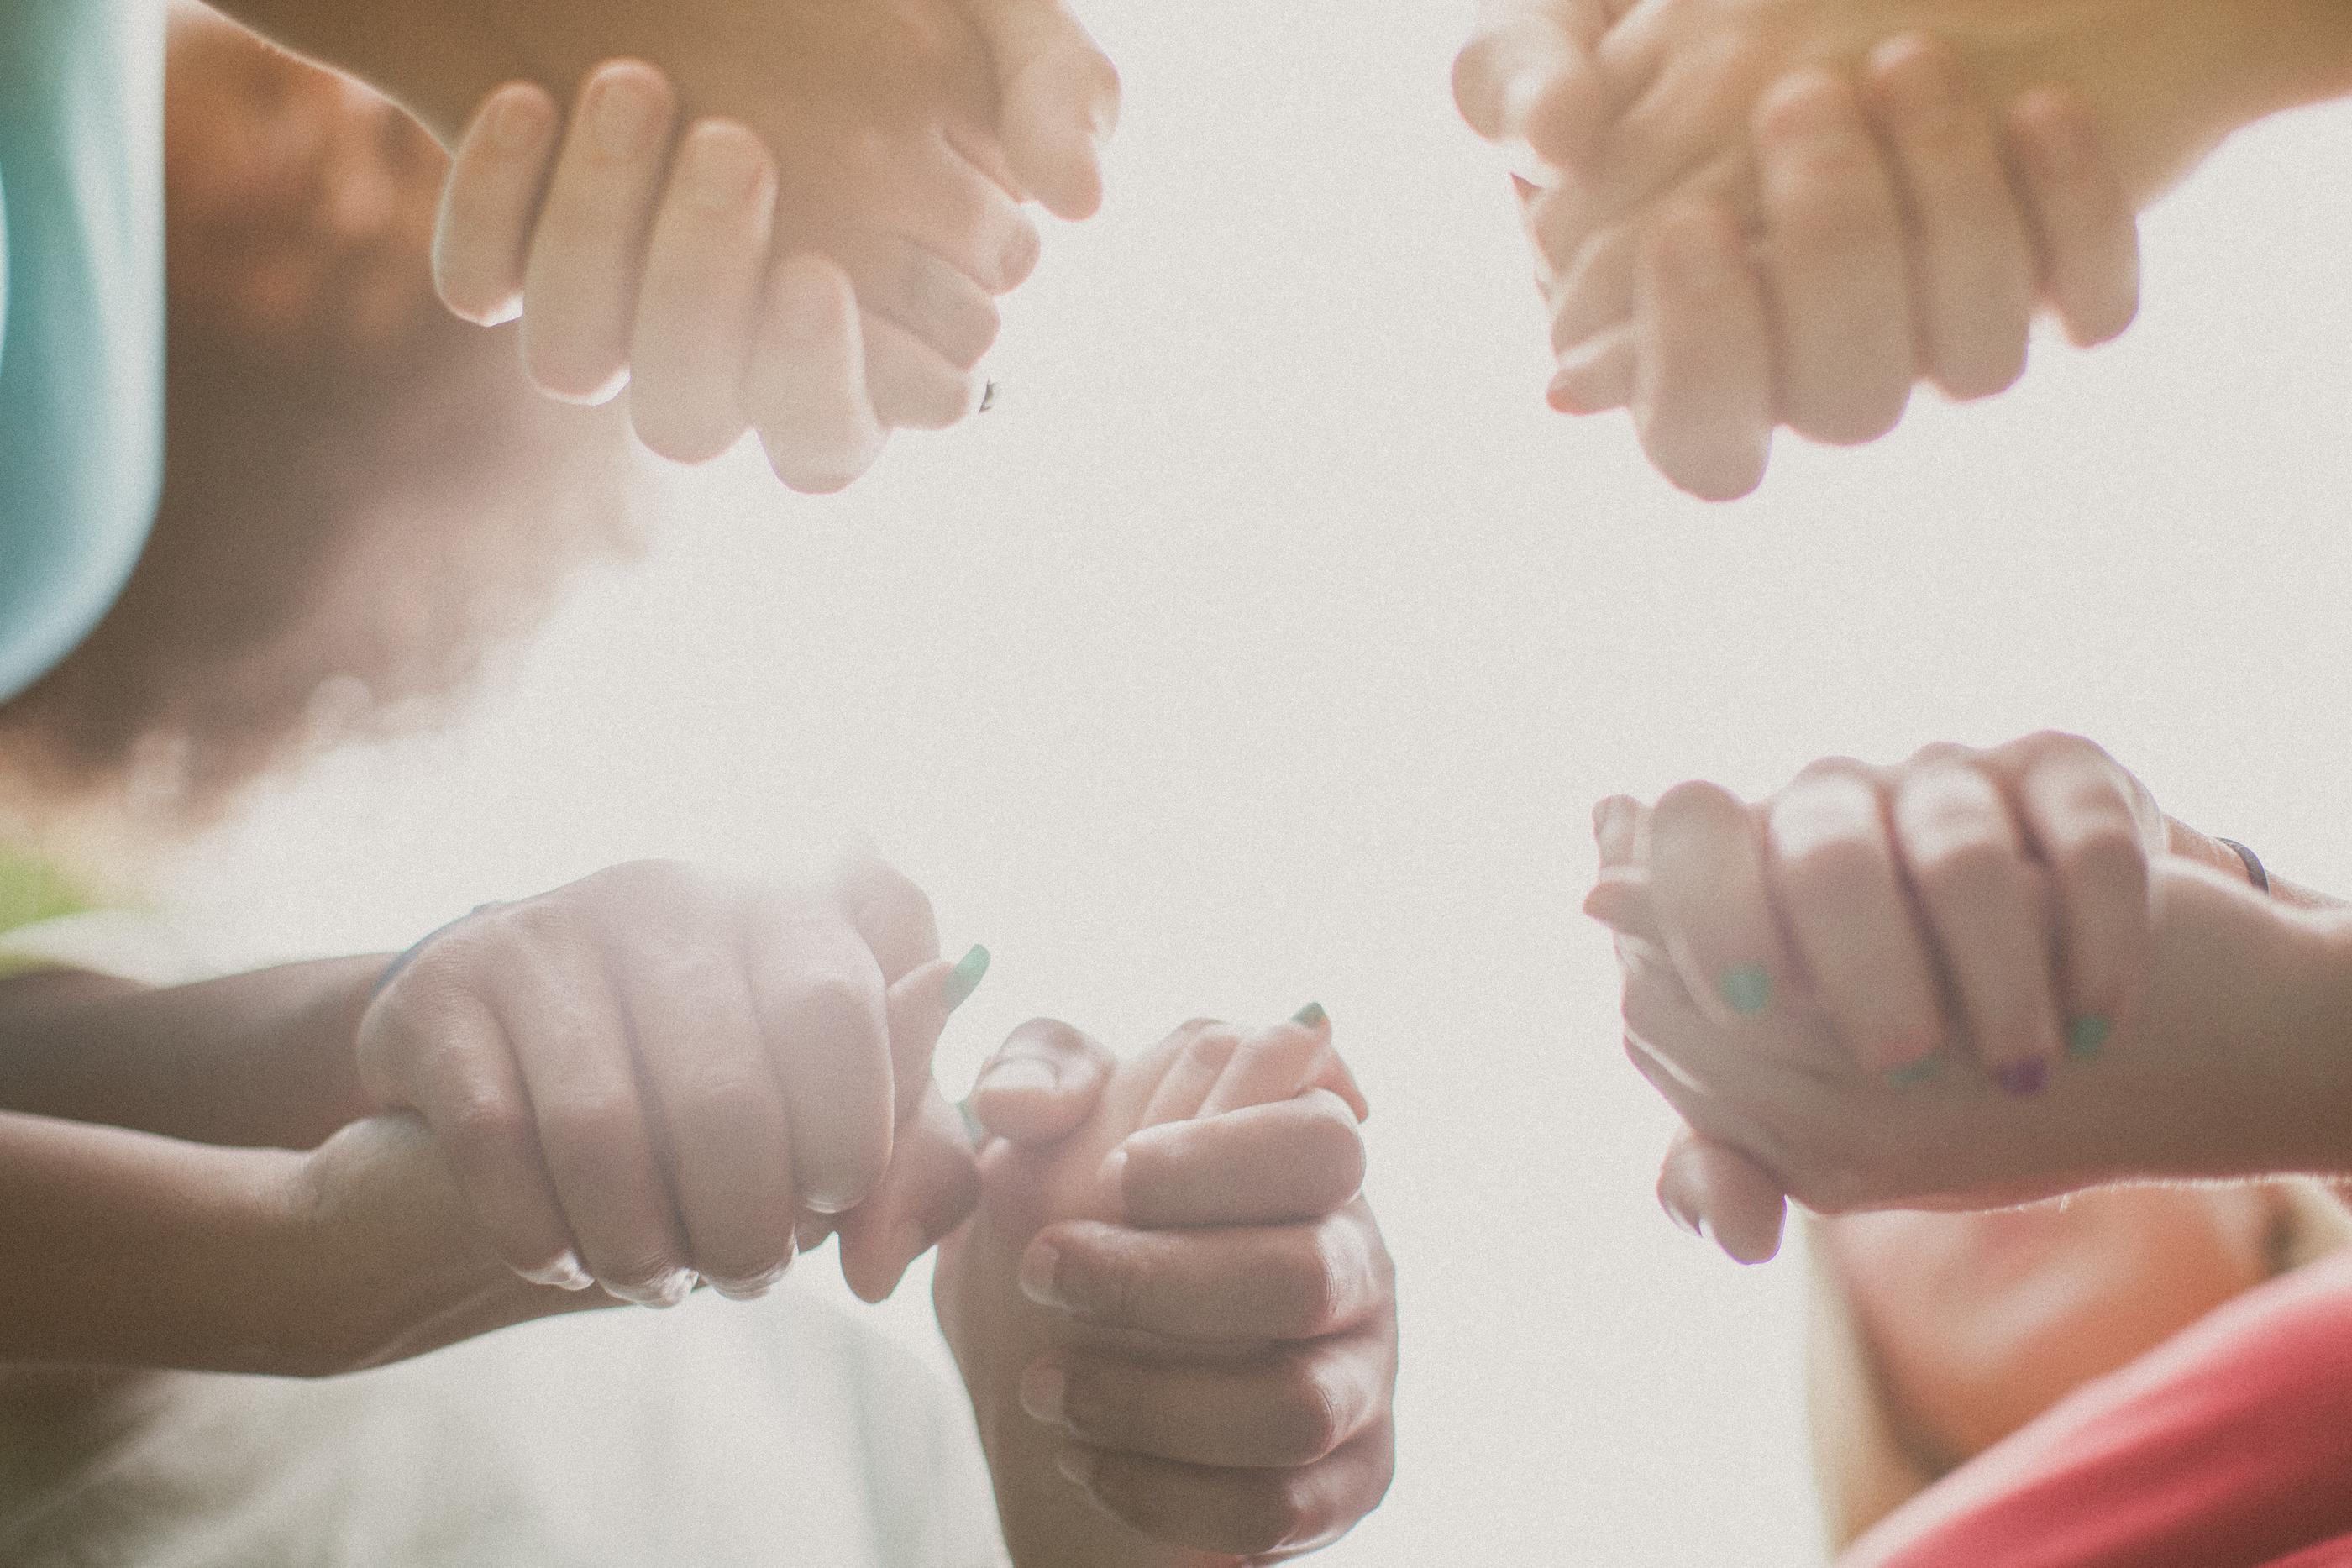 family praying hands